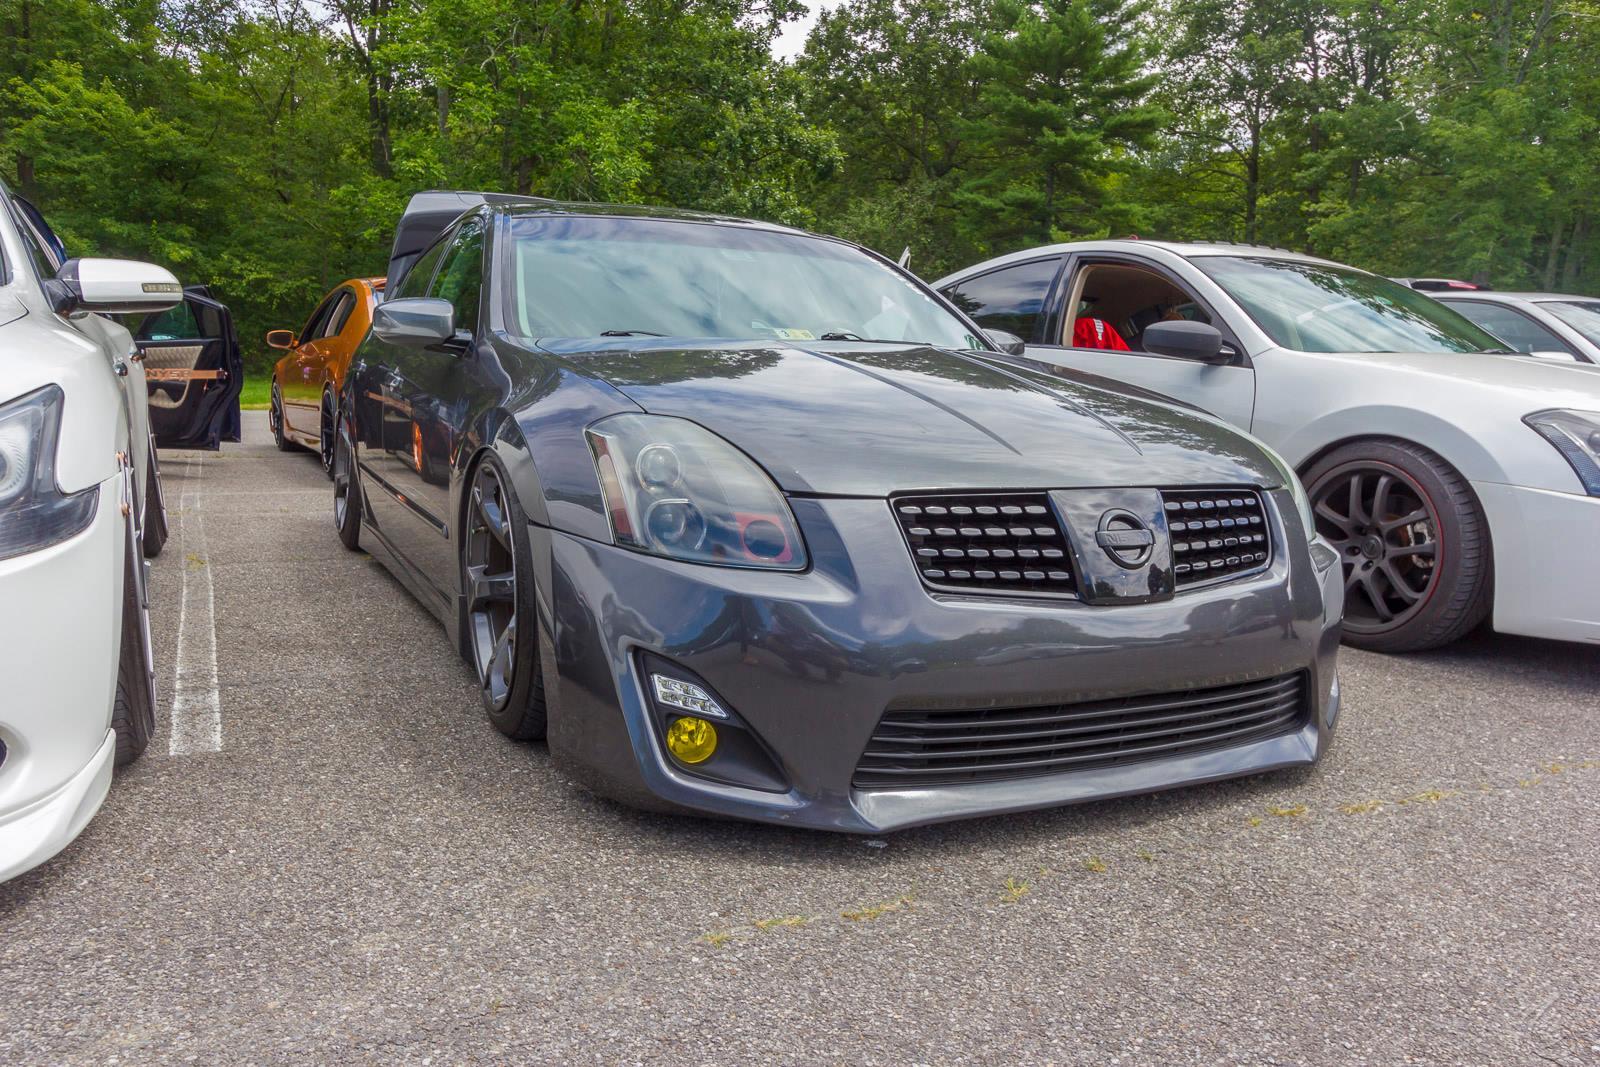 Custom Nissan Maxima >> 6thgen Maxima With Camry Hybrid Bumper Mashup